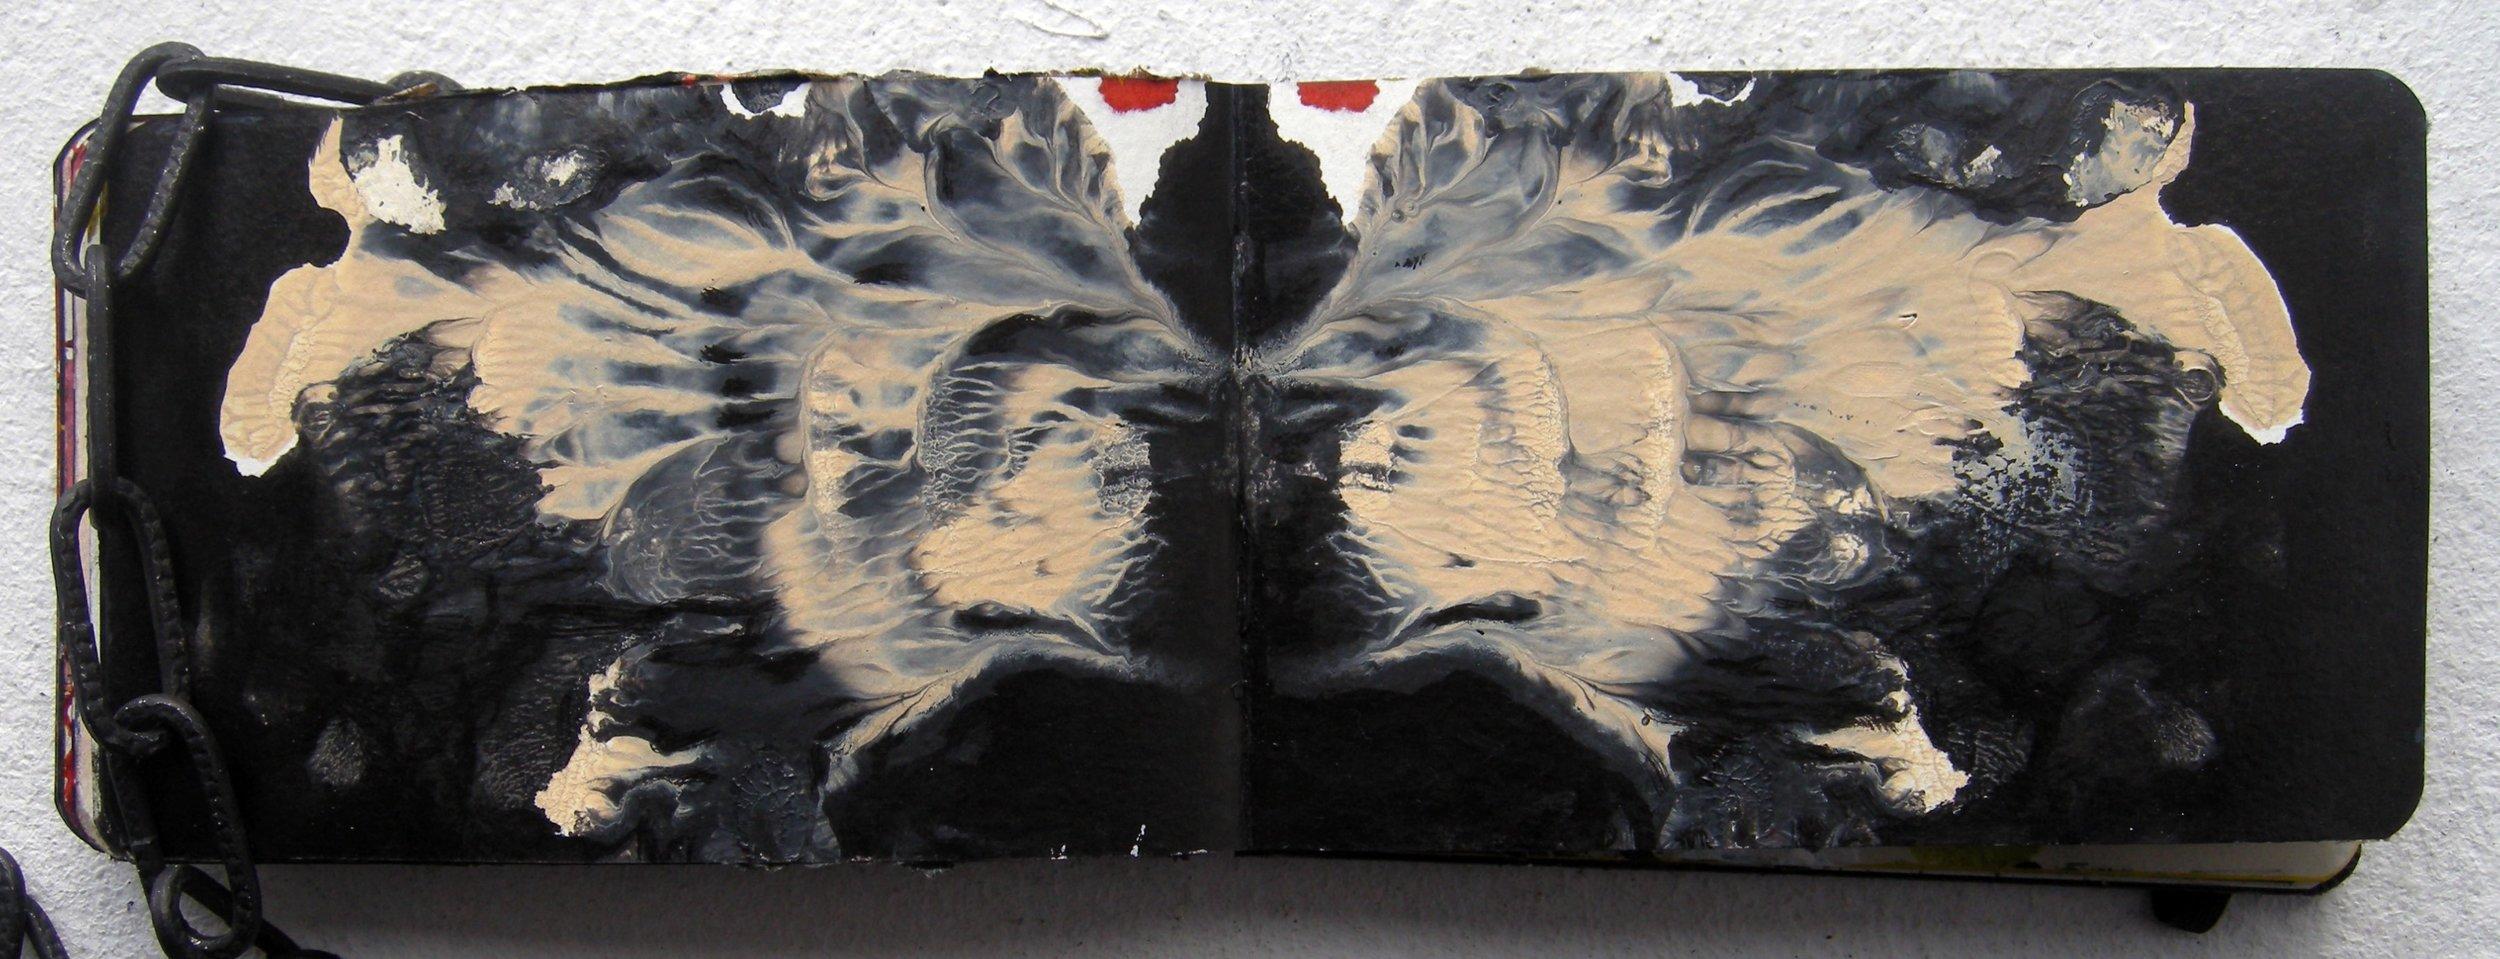 blackbook4.24.jpg